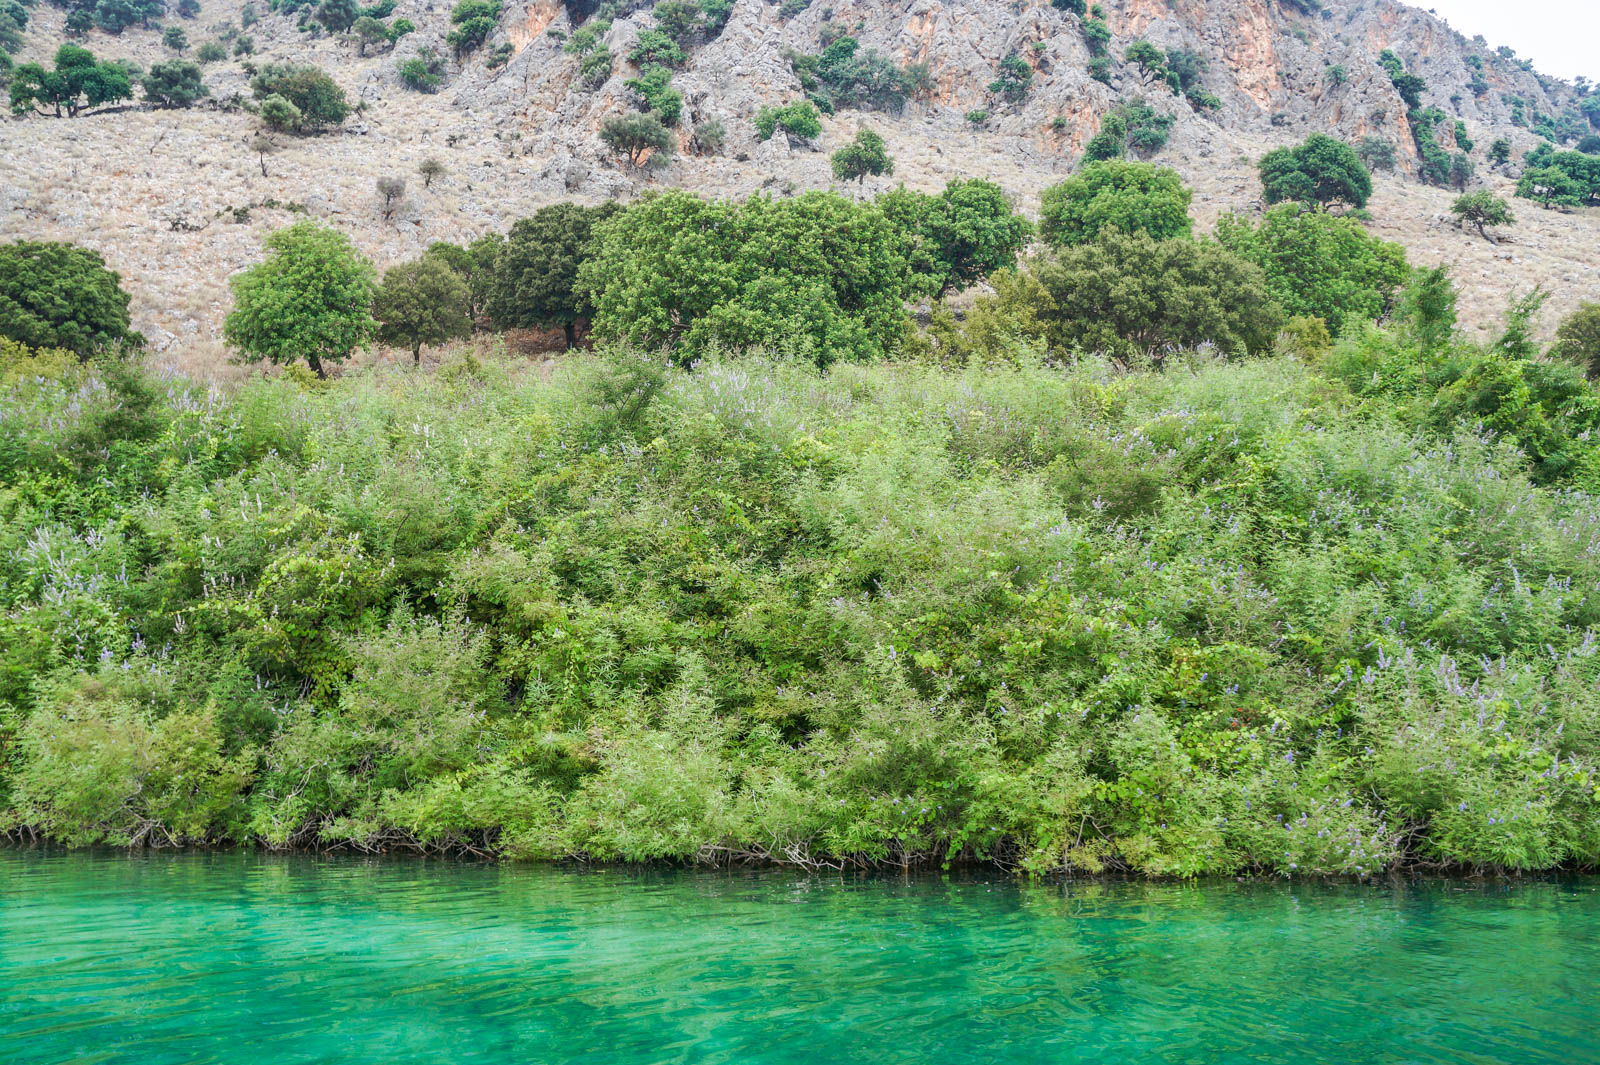 kourna-lake-crete-greece-la-vie-en-blog-all-rights-reserved-4